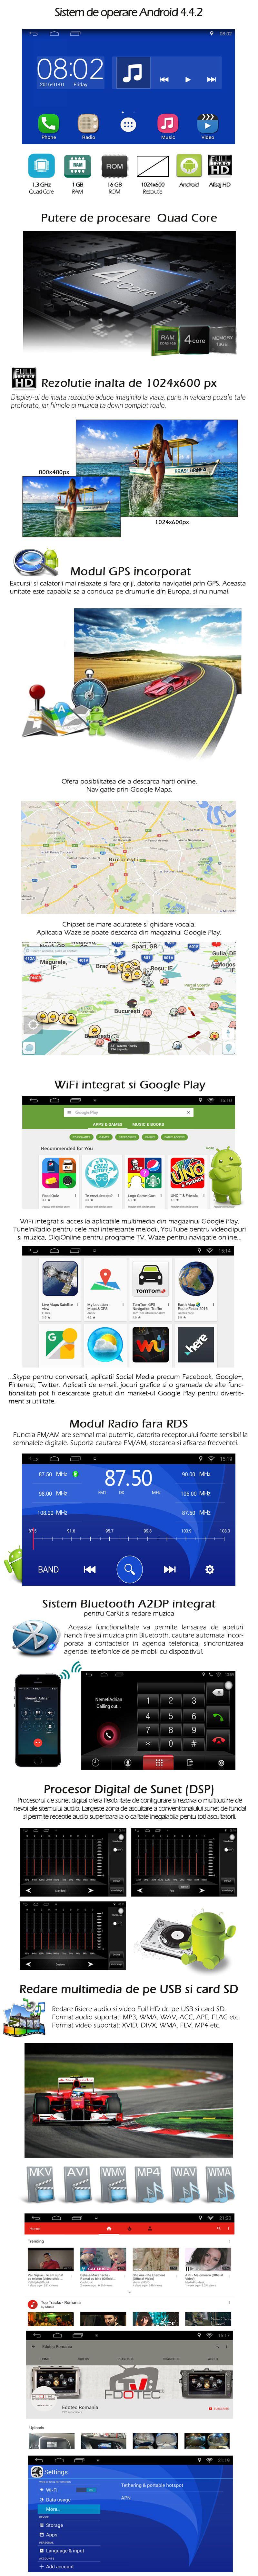 Navigatie dedicata Skoda 3 cu Android gps bluetooth internet wifi usb sd